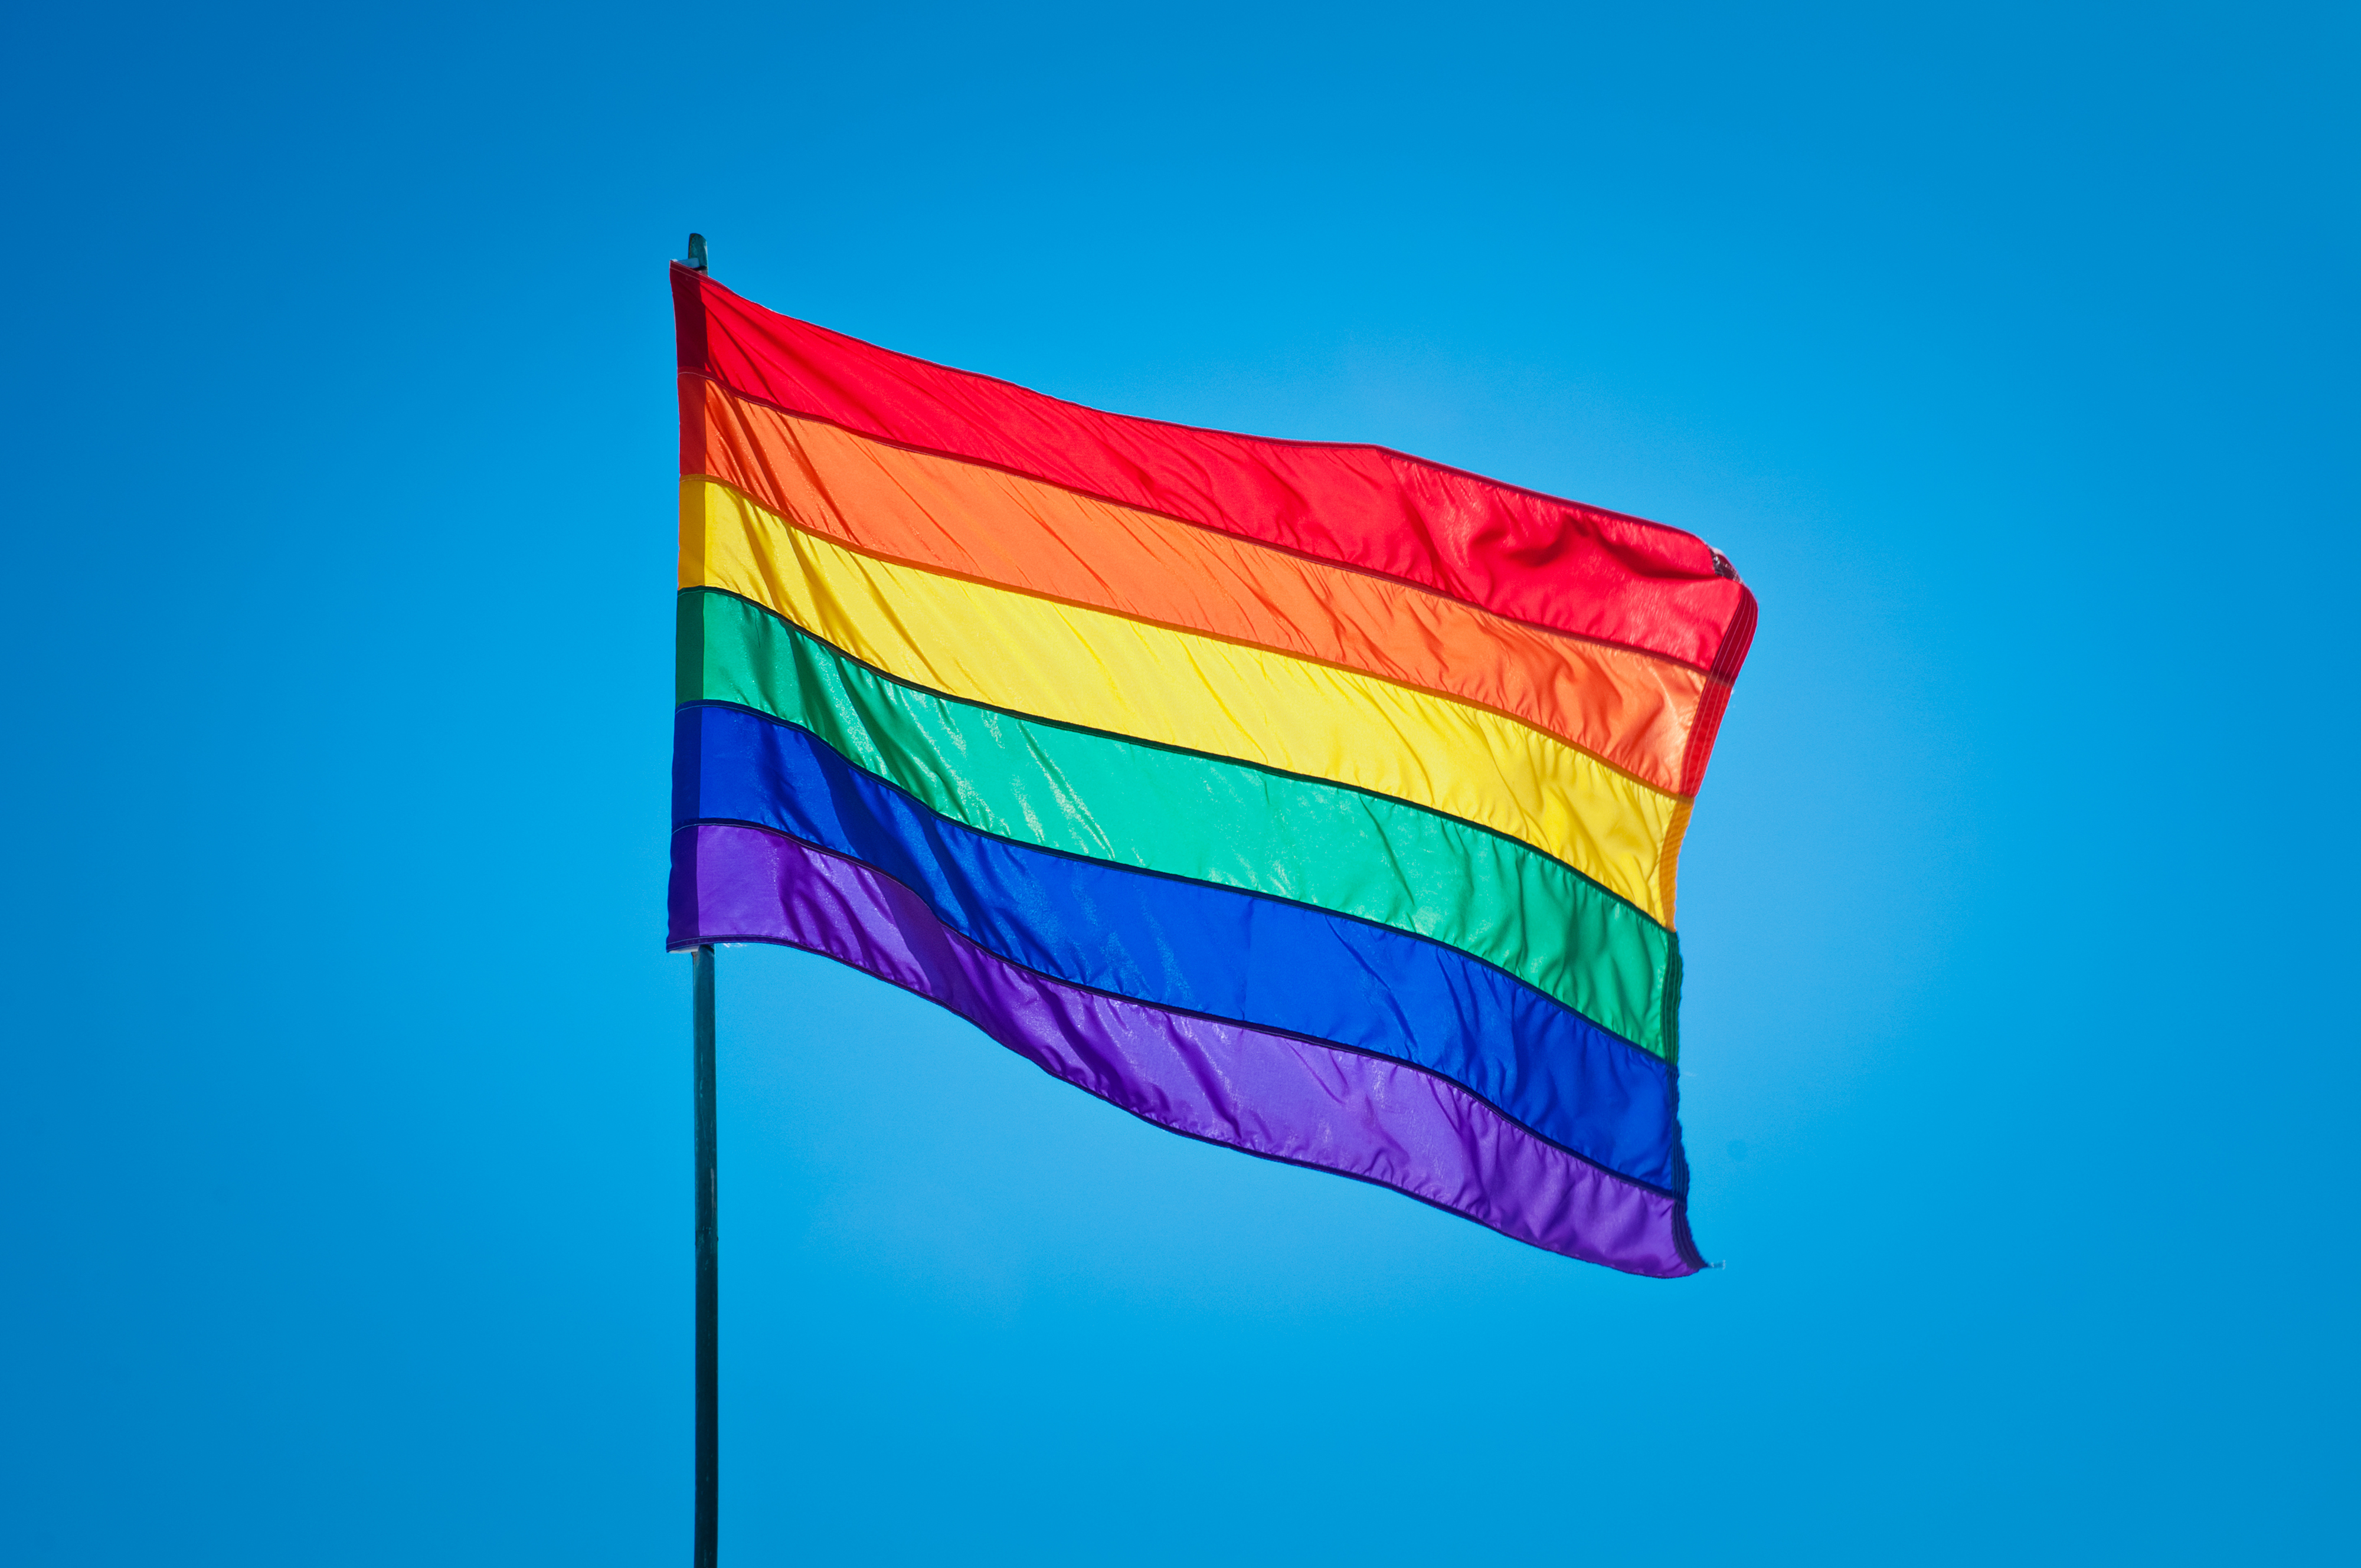 Kenneth Mehlman Supports Illinois Marriage Bill